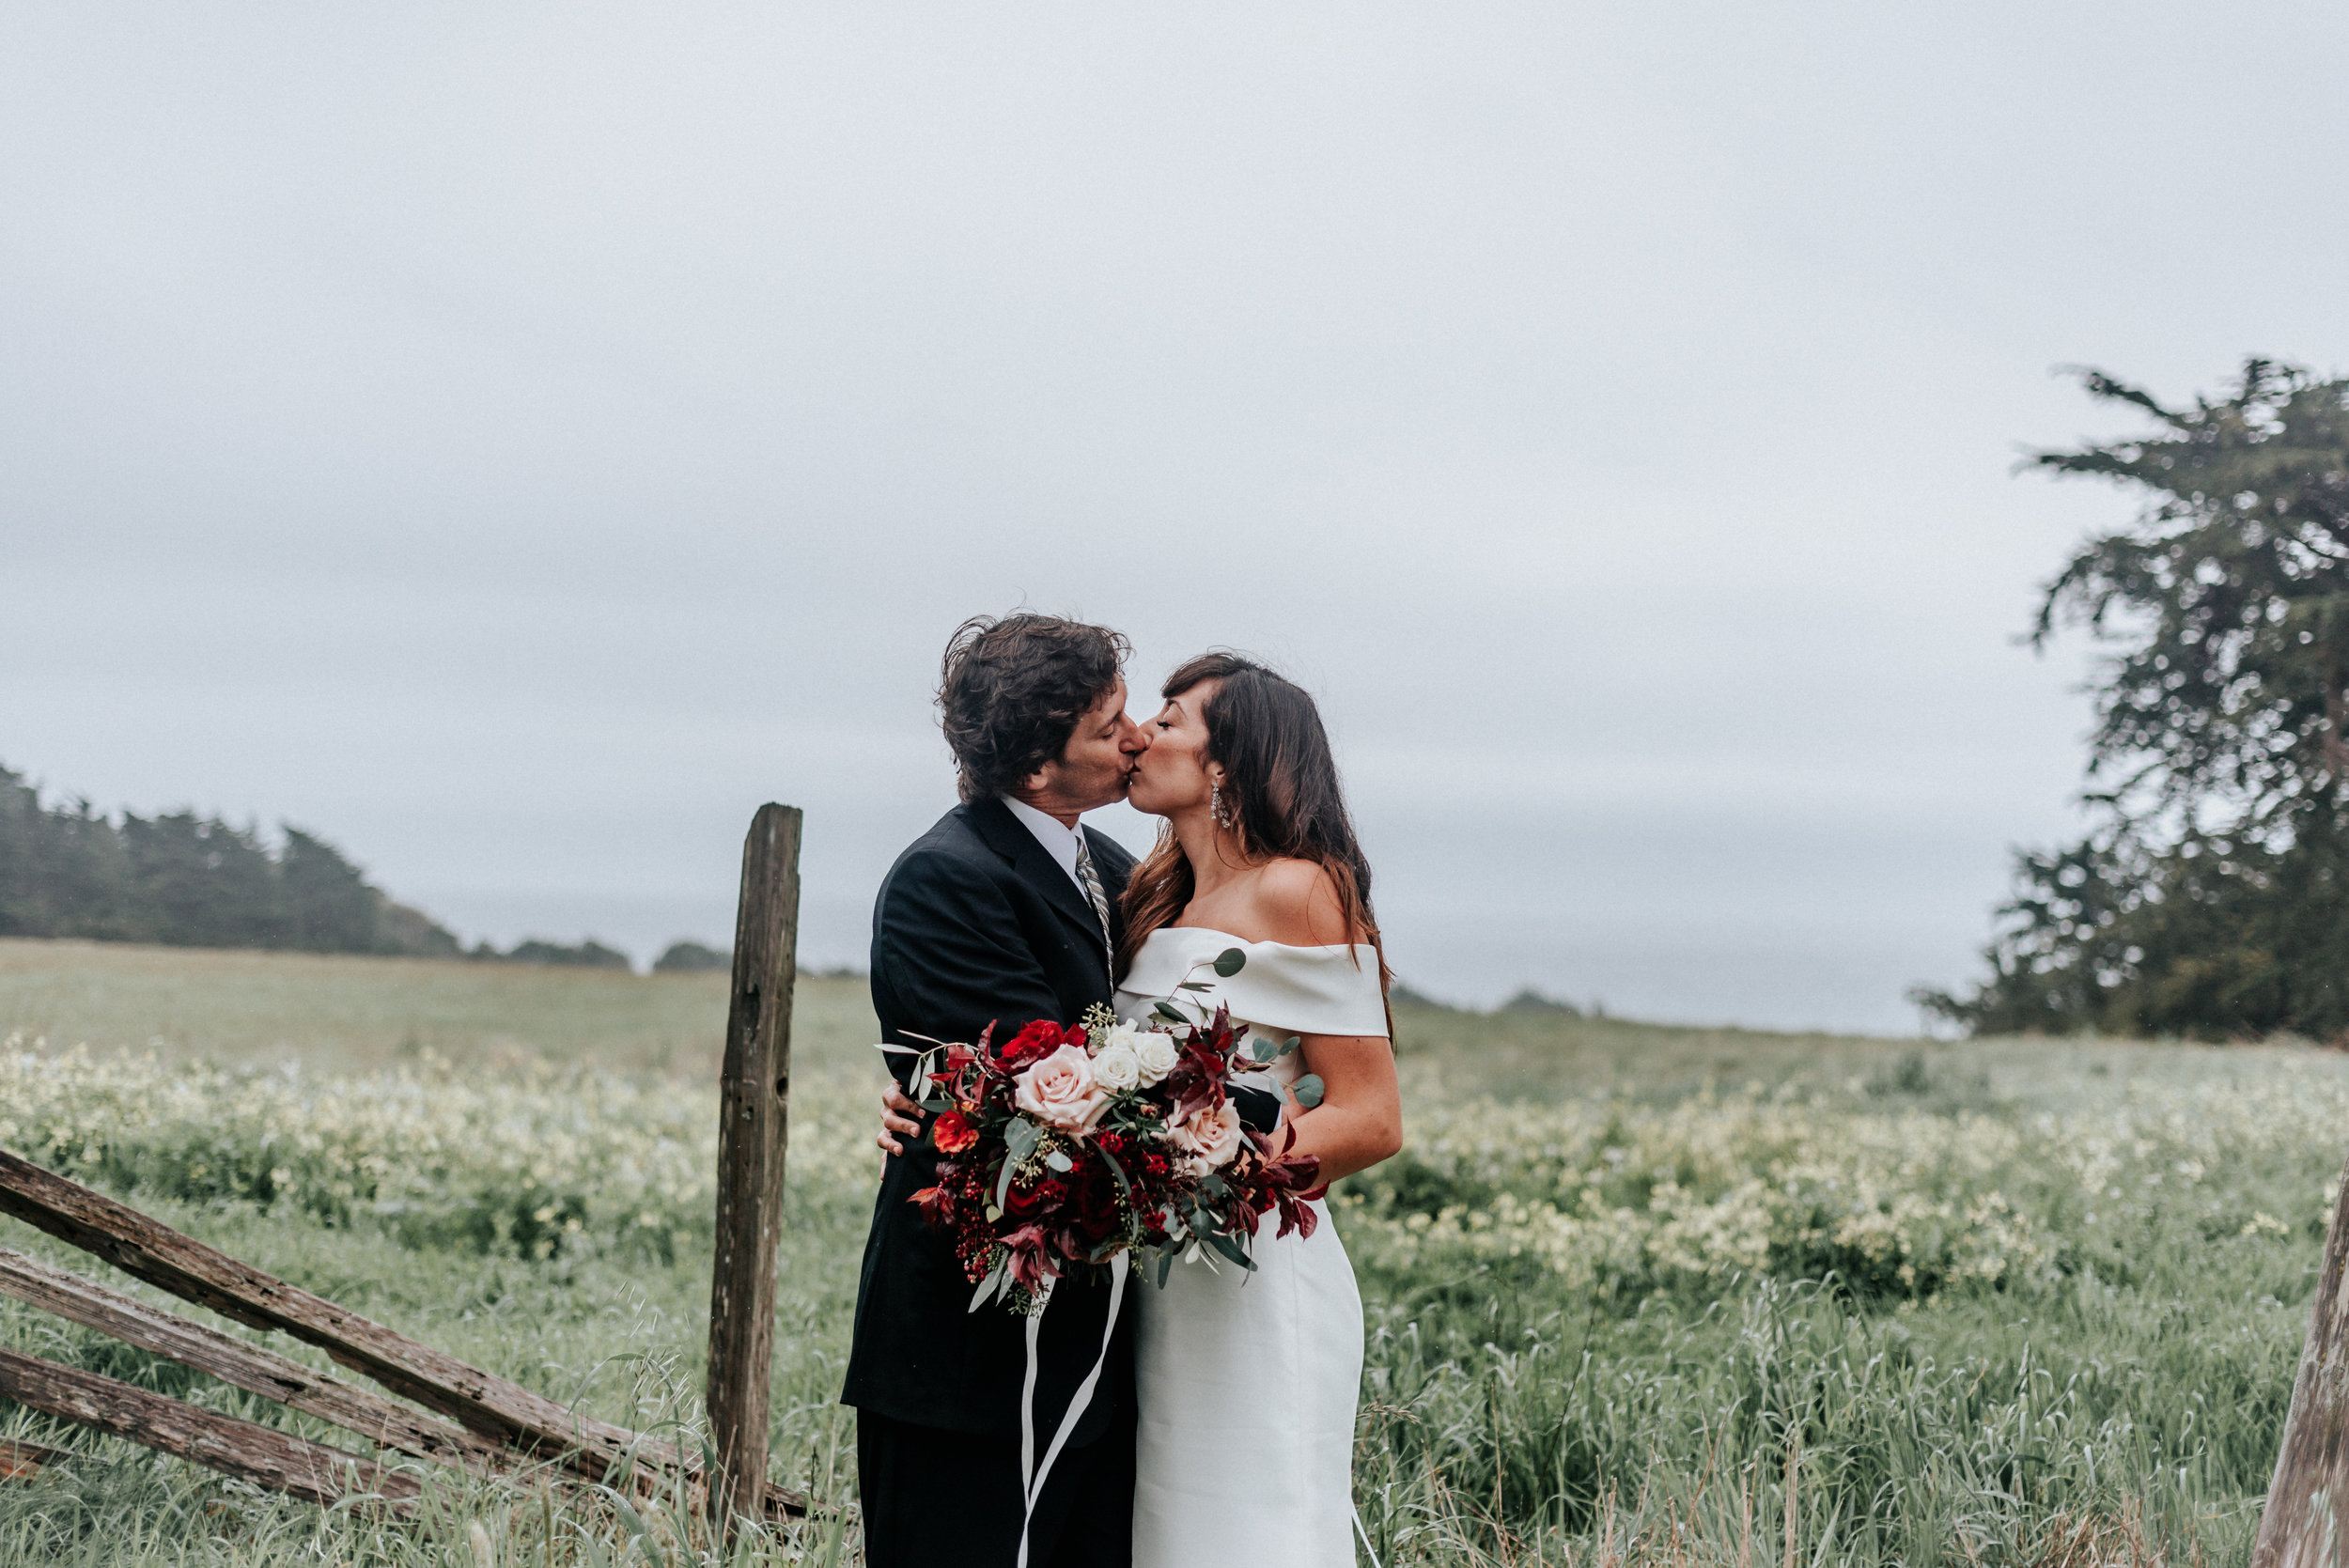 Albion River Inn Wedding in Albion Caliornia-16.jpg